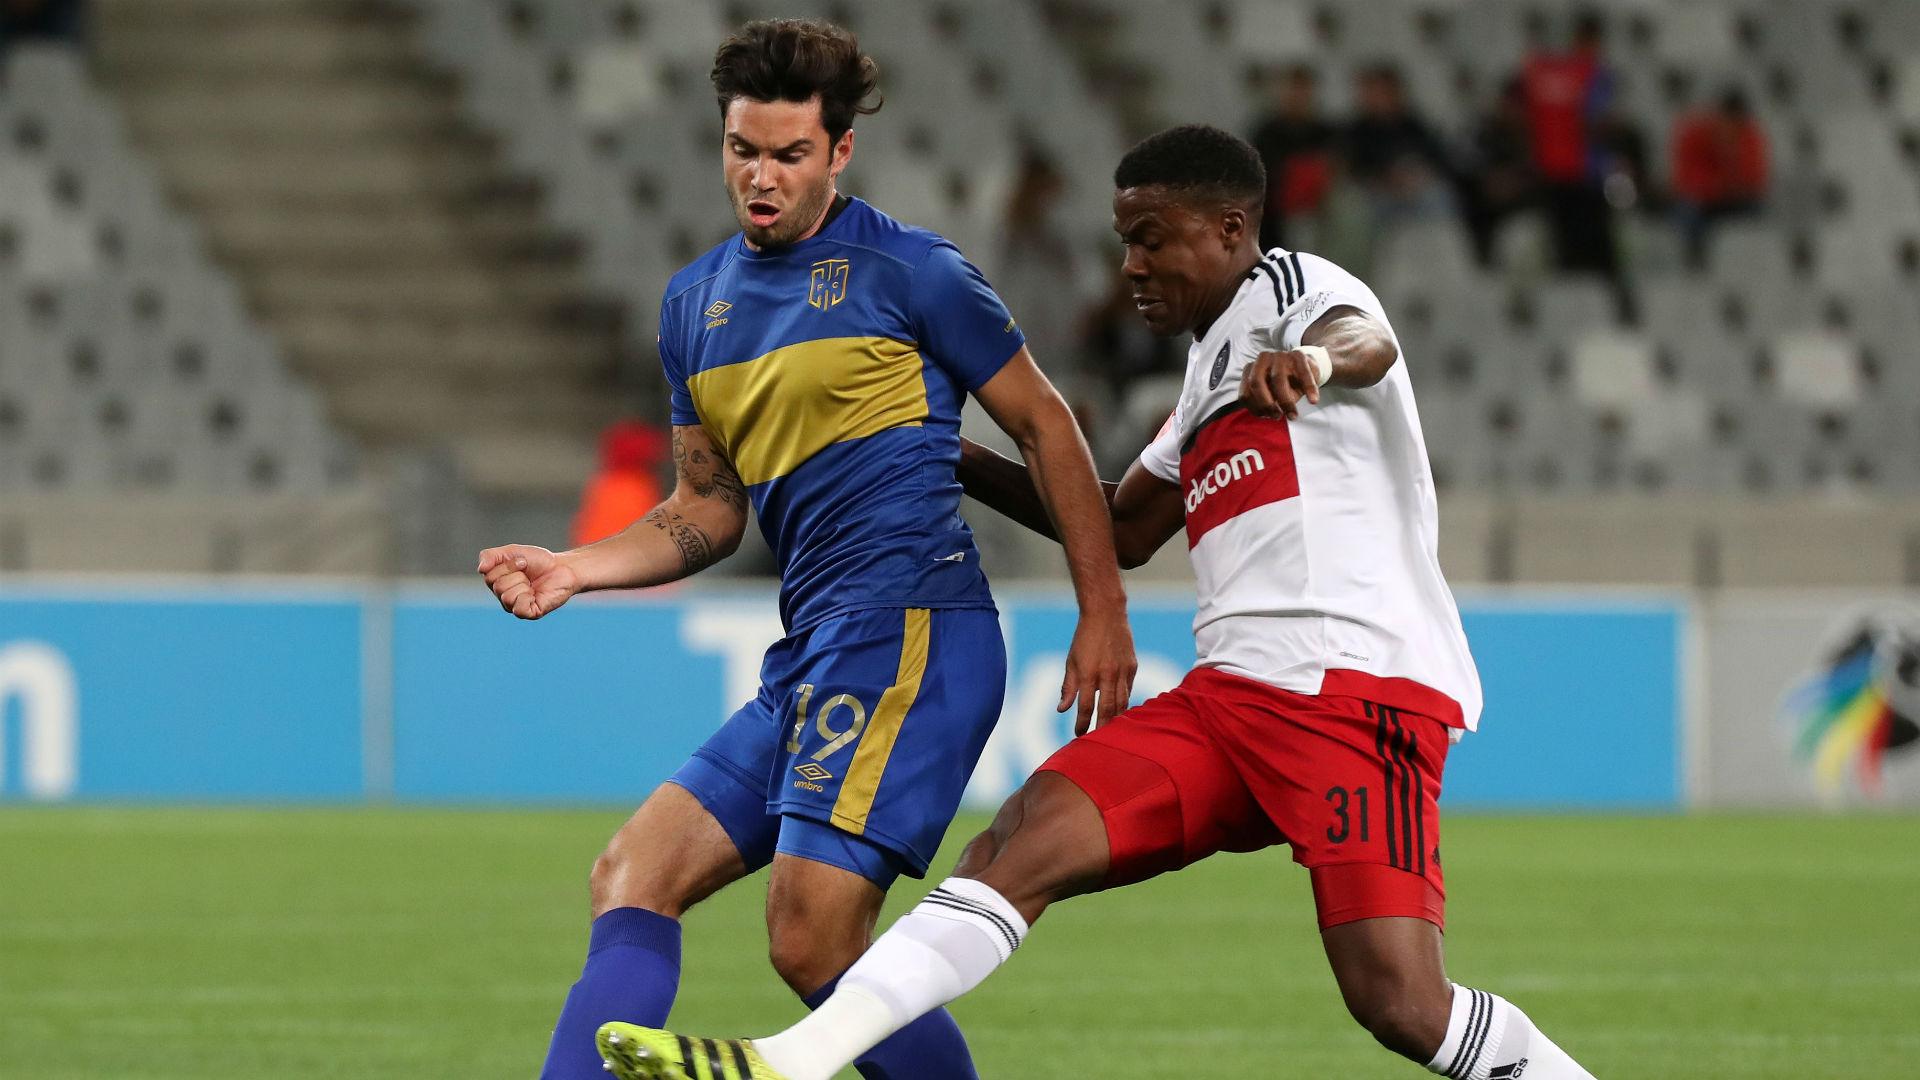 Cape Town City, Roland Putsche & Pirates, Thamsanqa Gabuza